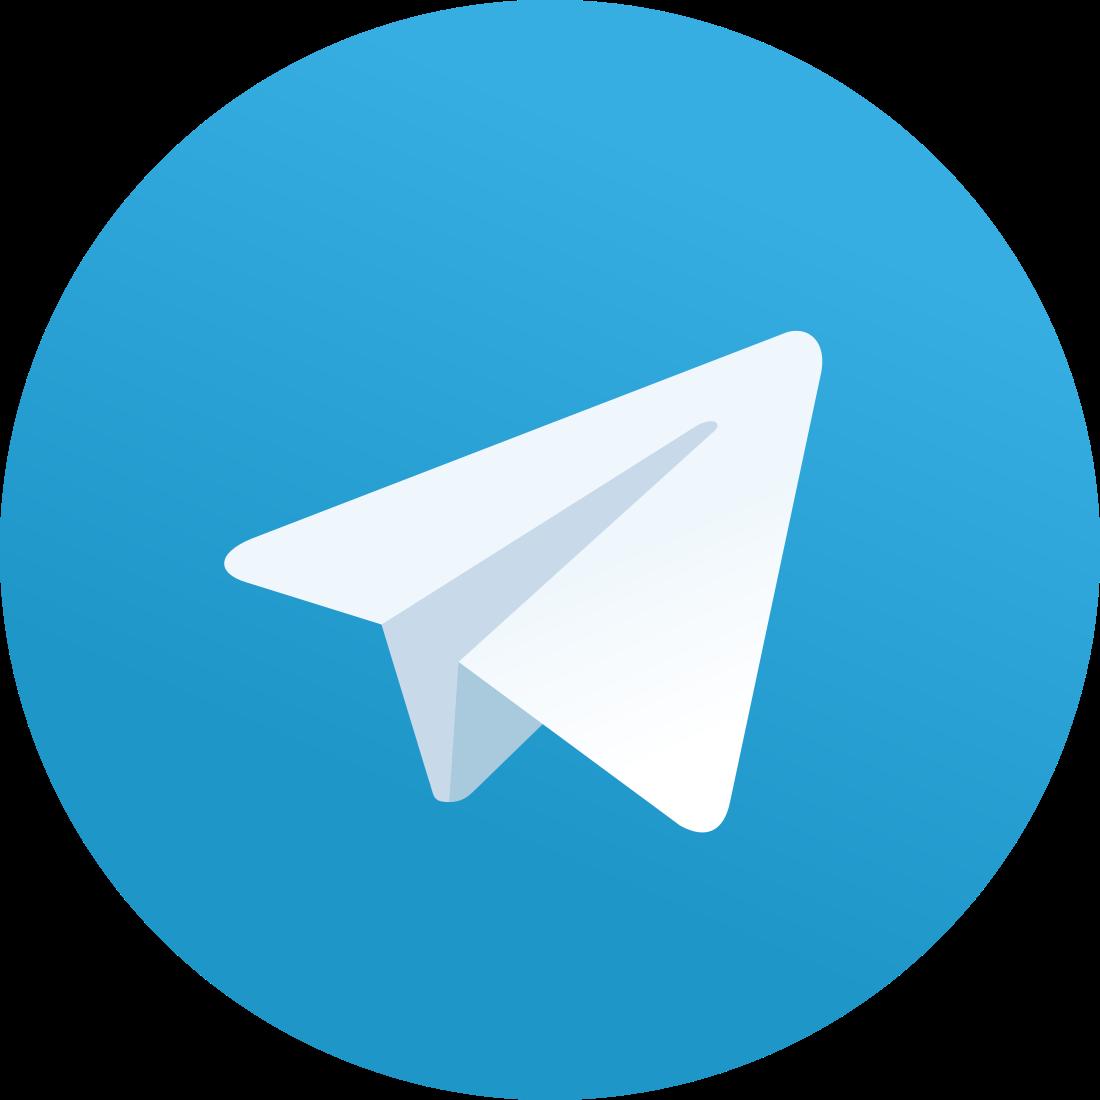 telegram-logo-3.png